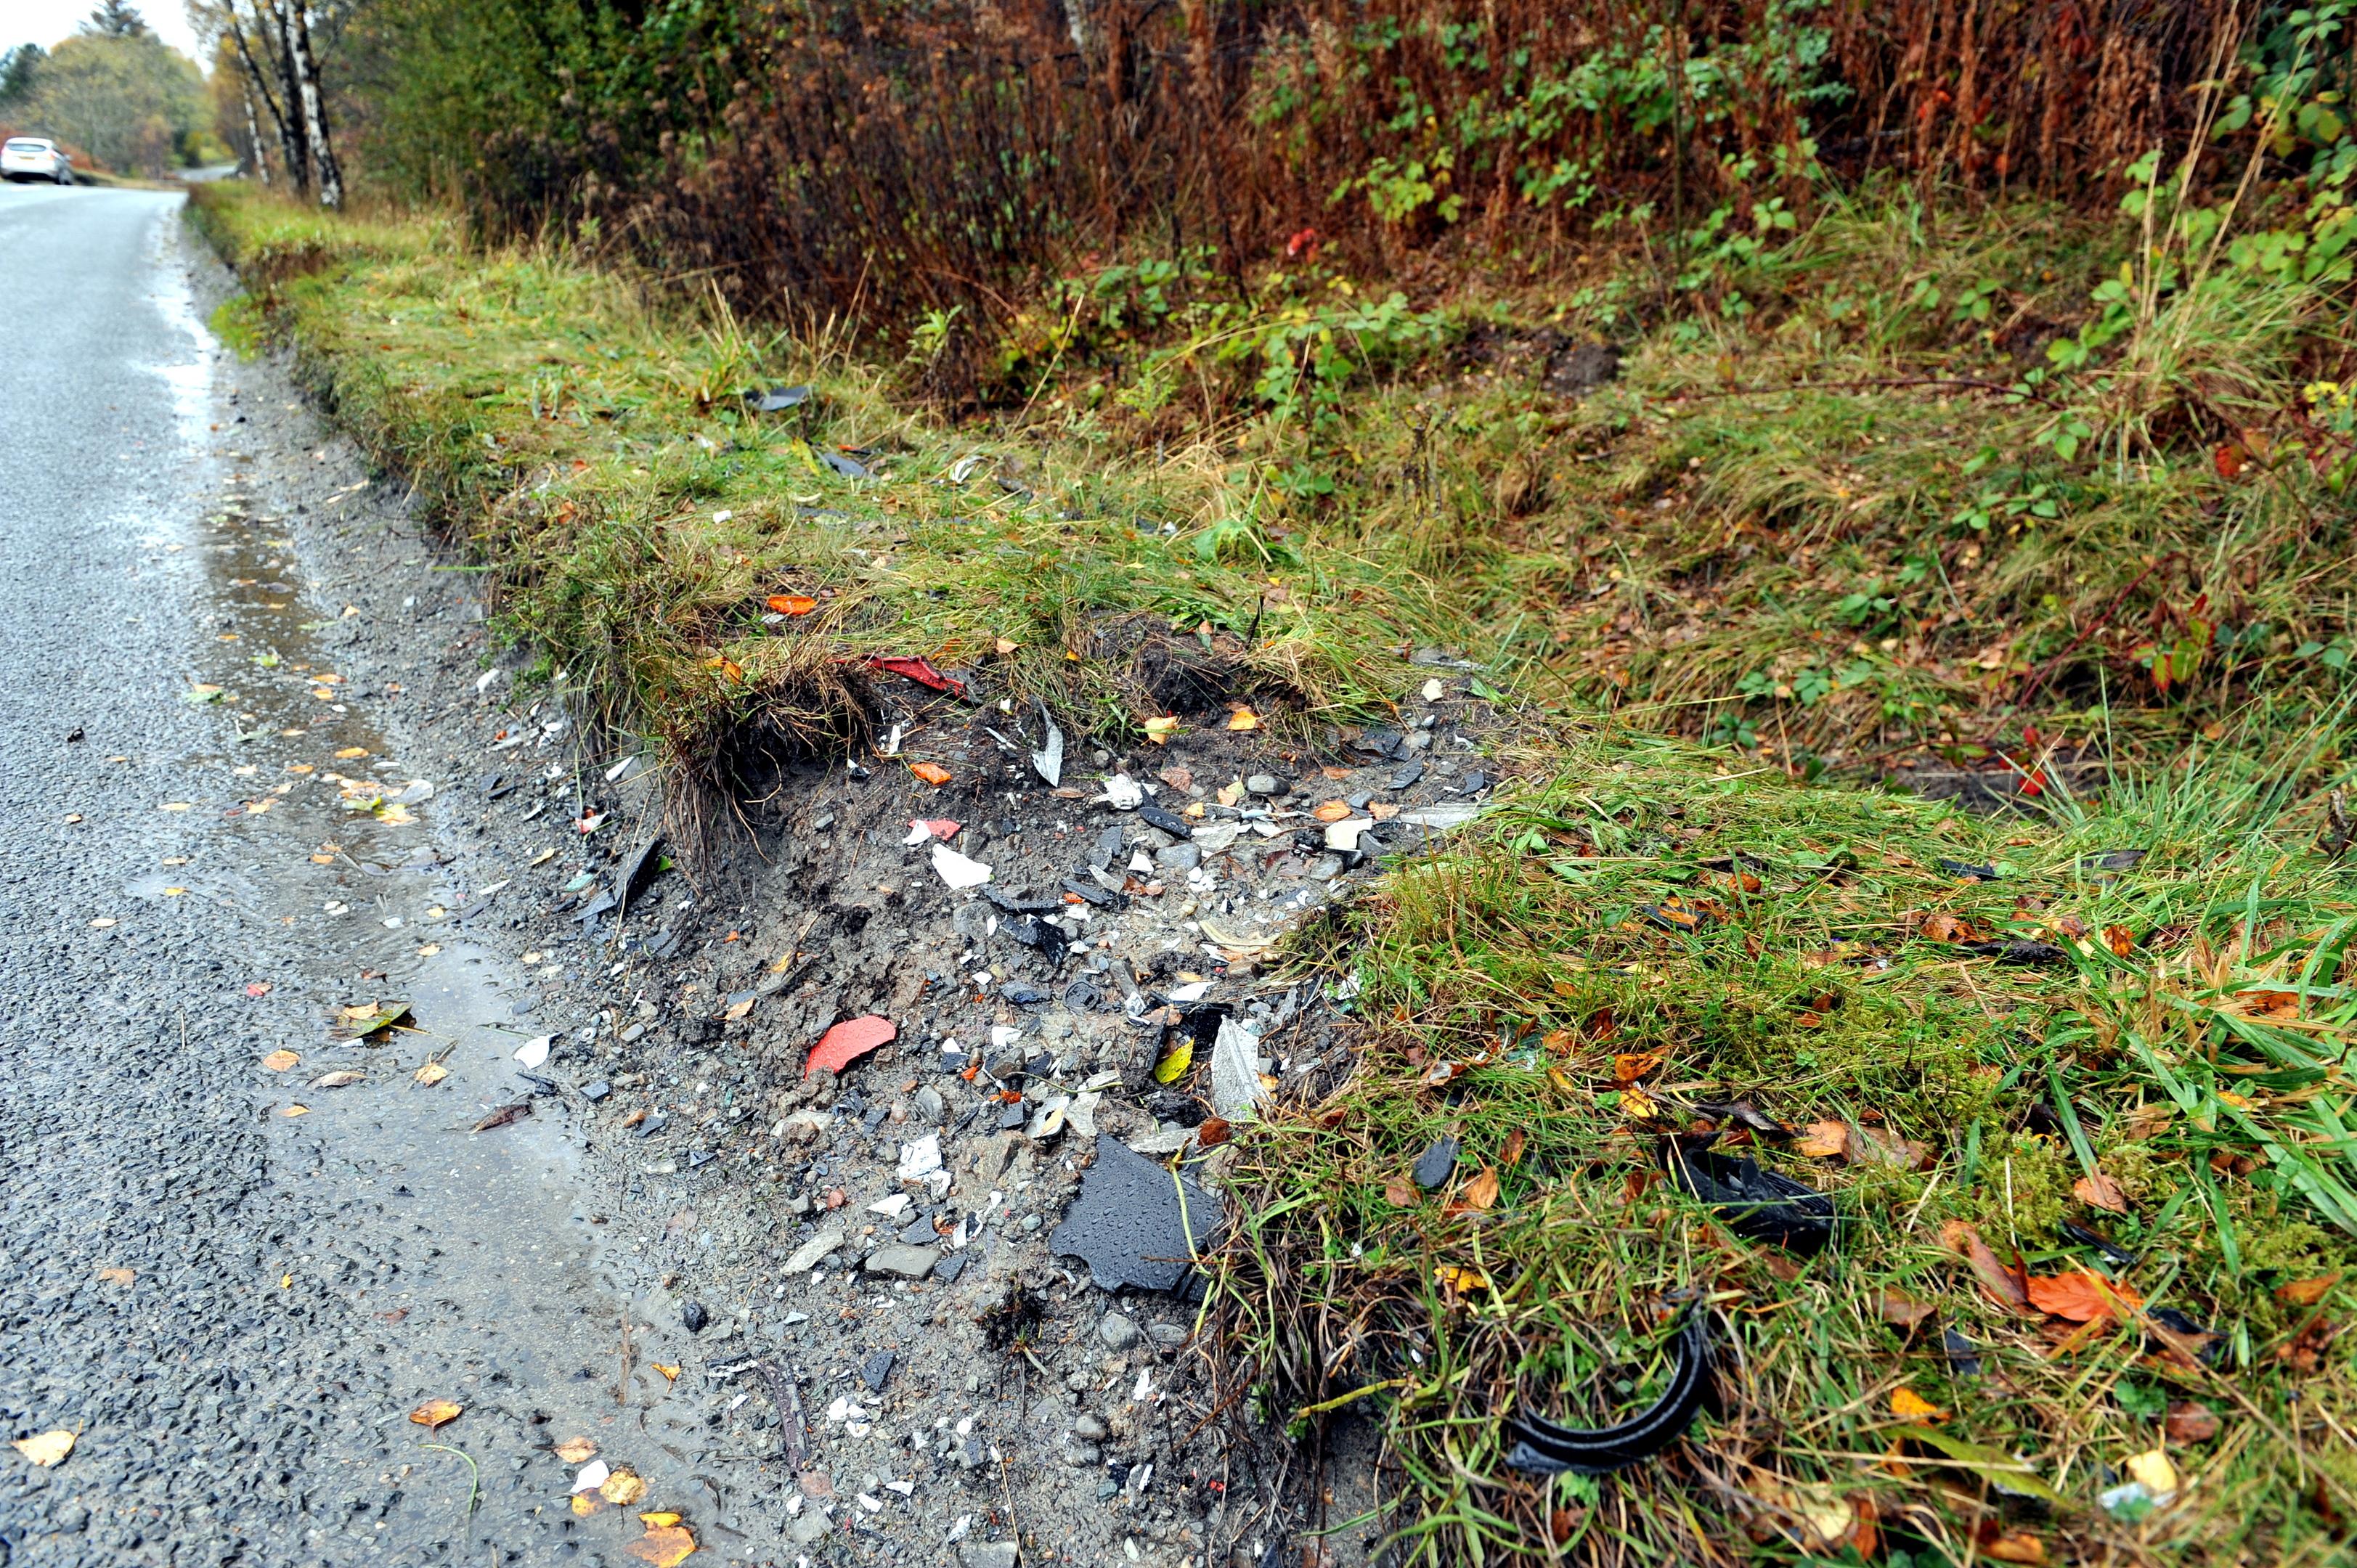 The scene of the 2014 crash